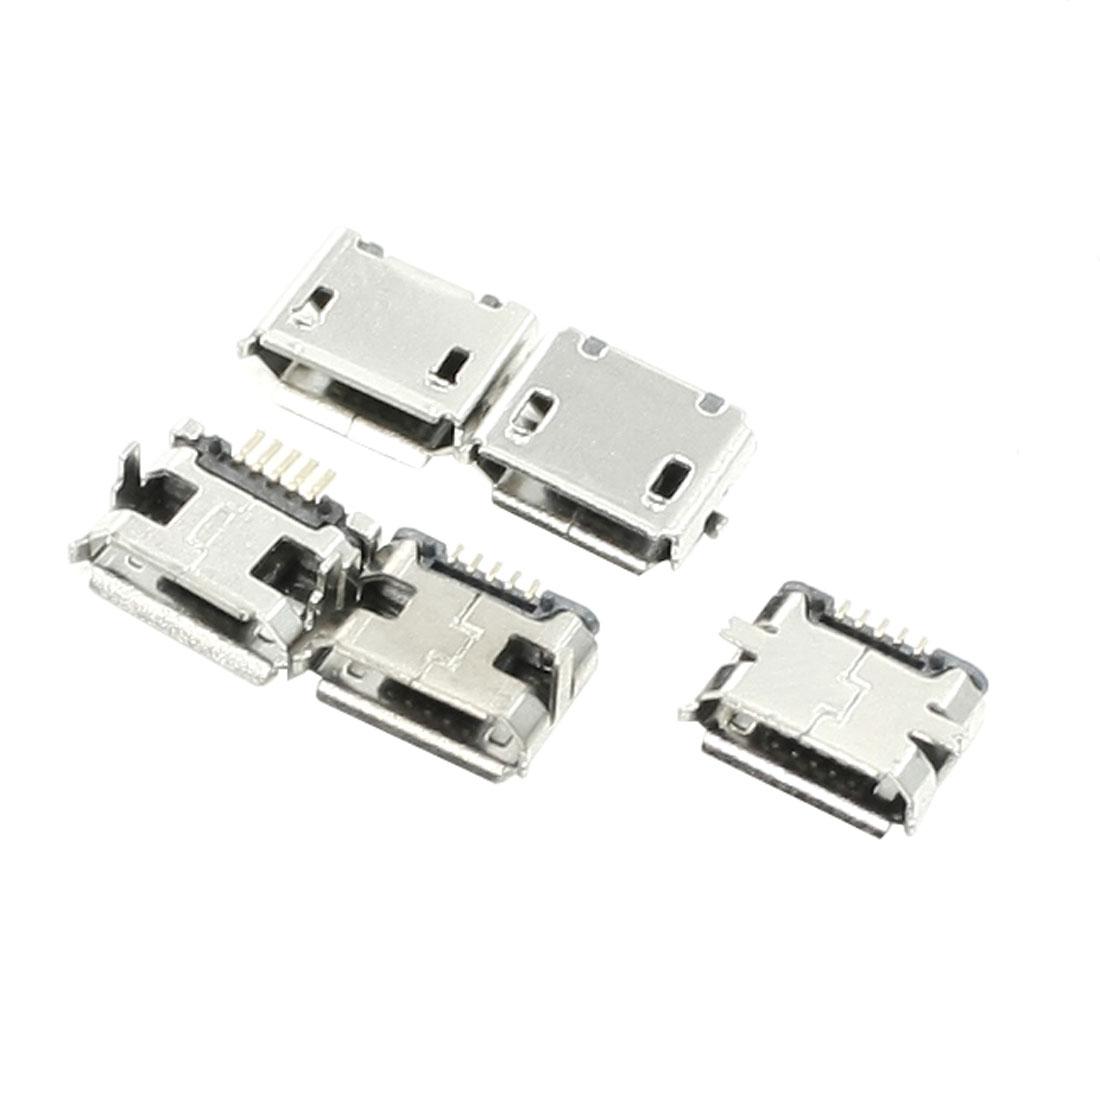 Computer Metal Micro USB Type B Female Connector 5 Pin SMT PCB Mount Port 5 Pcs